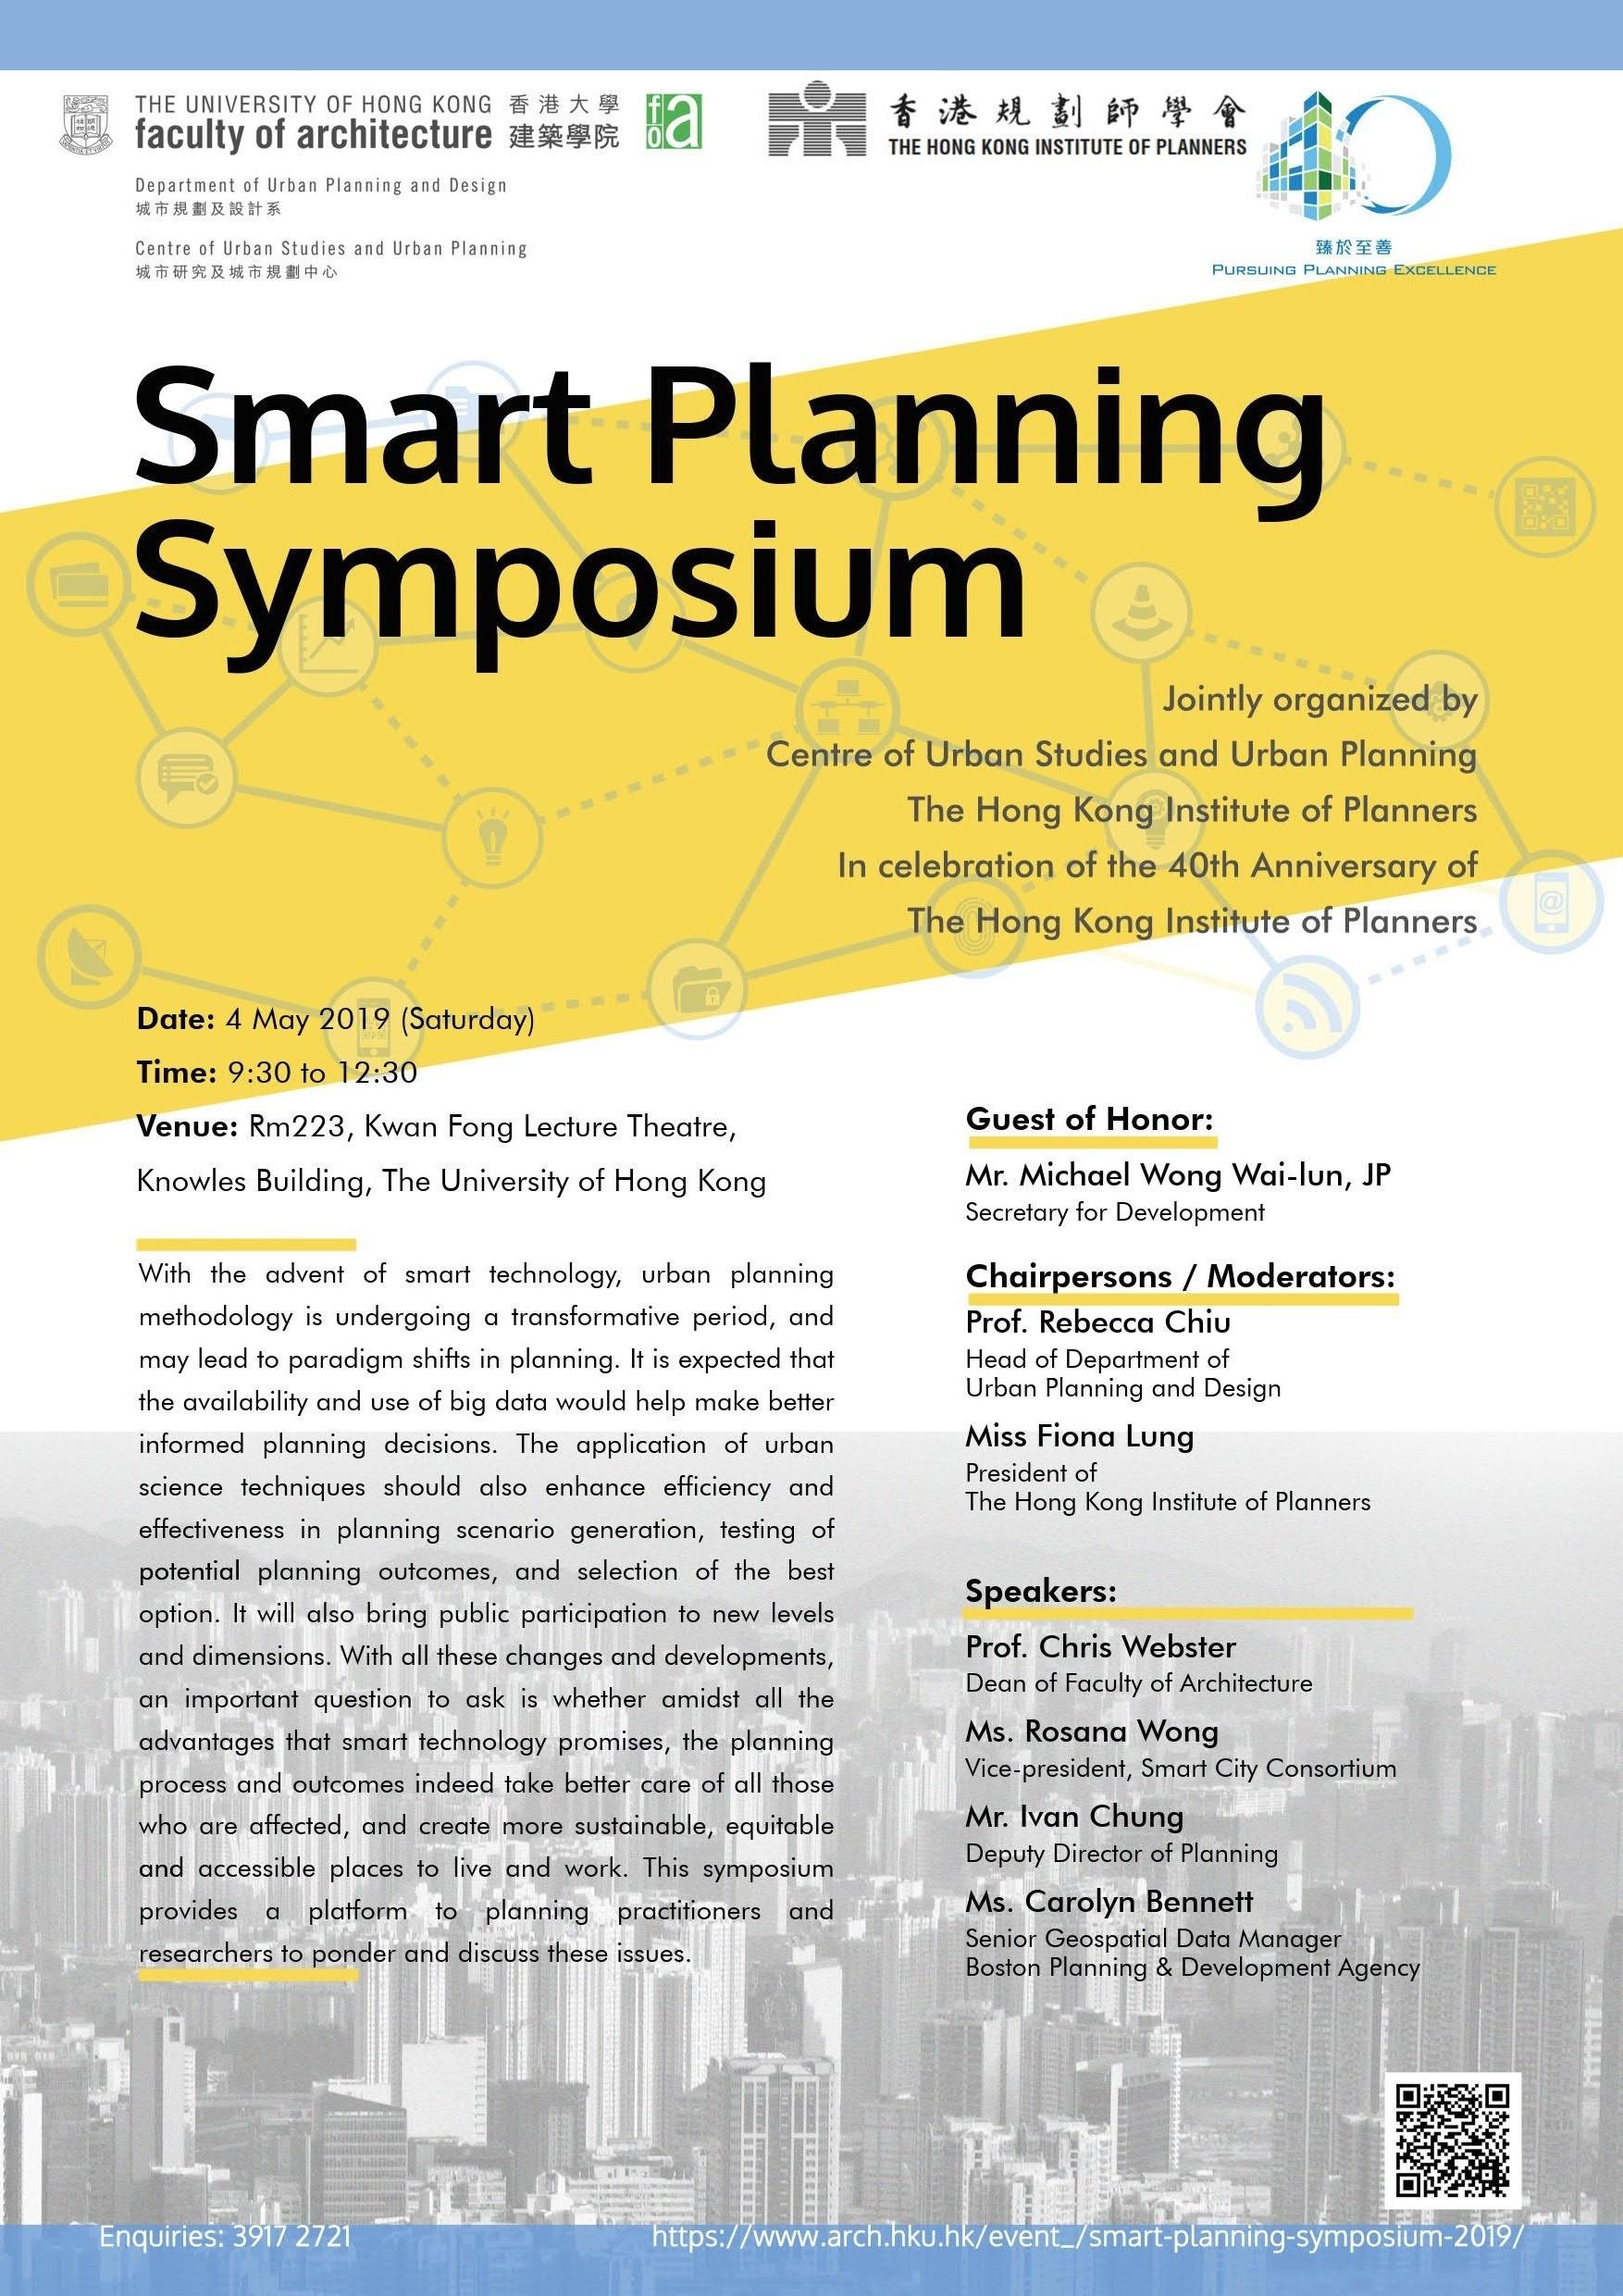 Smart-City-Symposium-Poster 2019.jpg